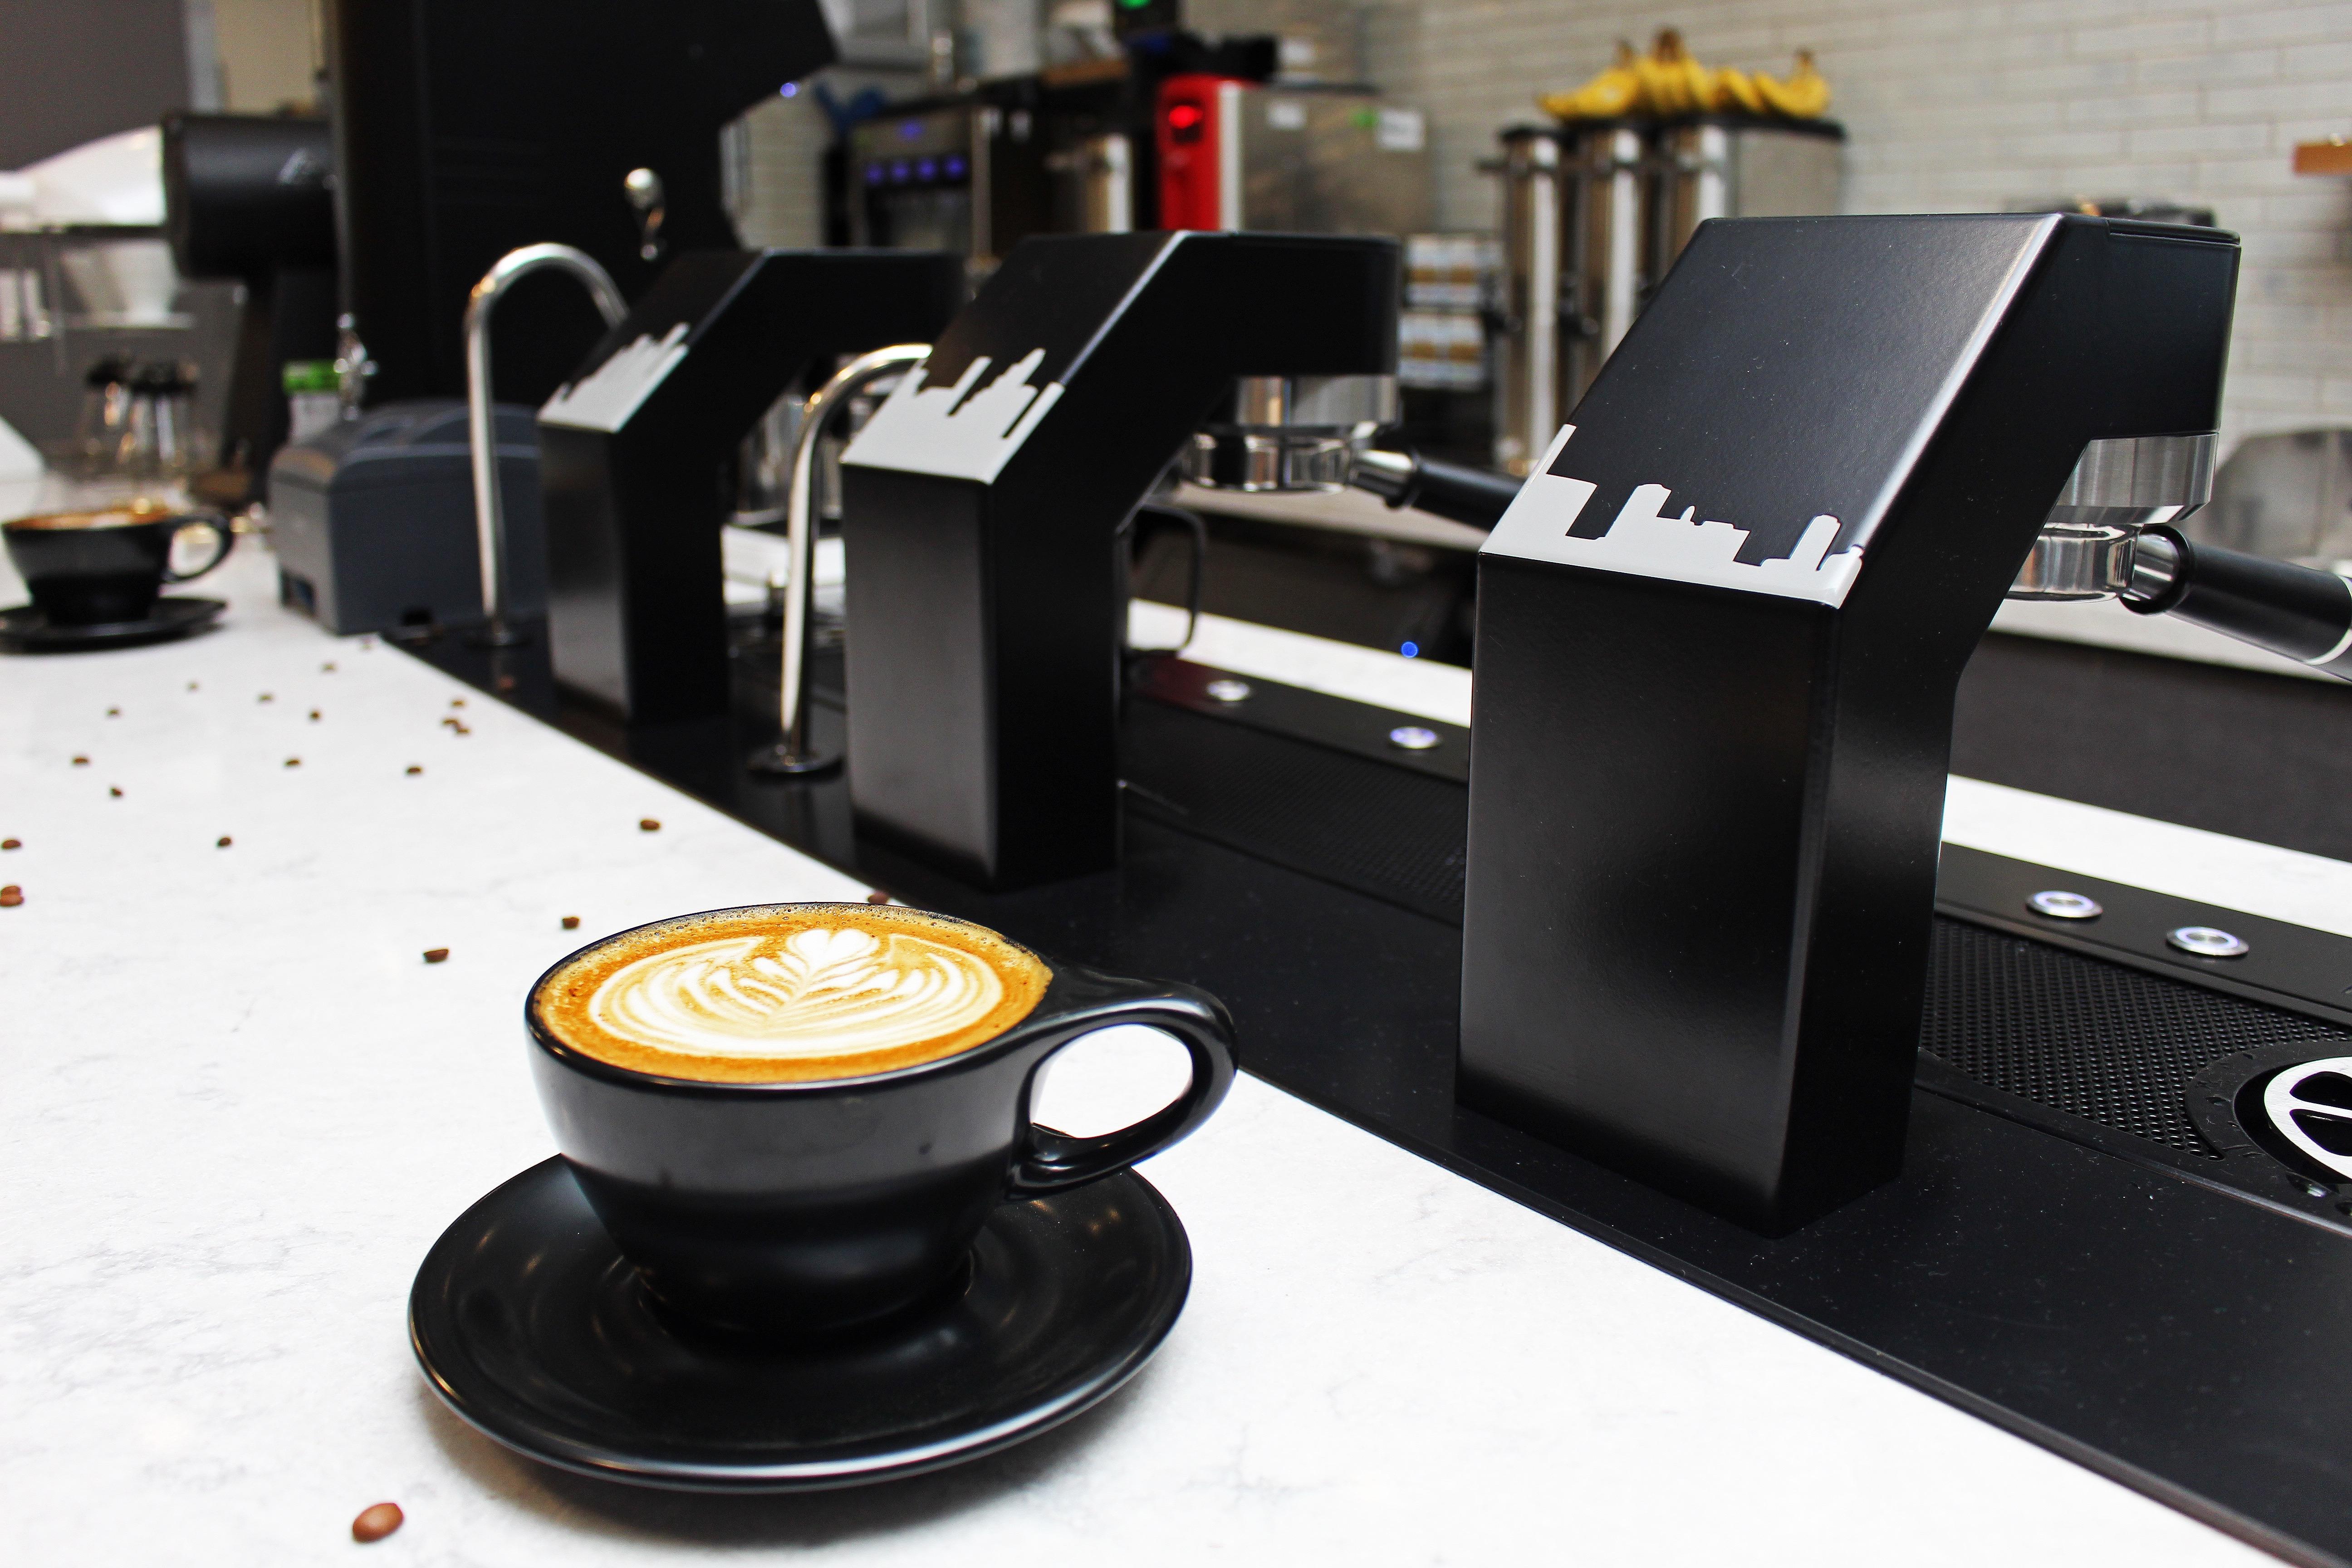 The espresso machine at The Roastery Coffee Kitchen